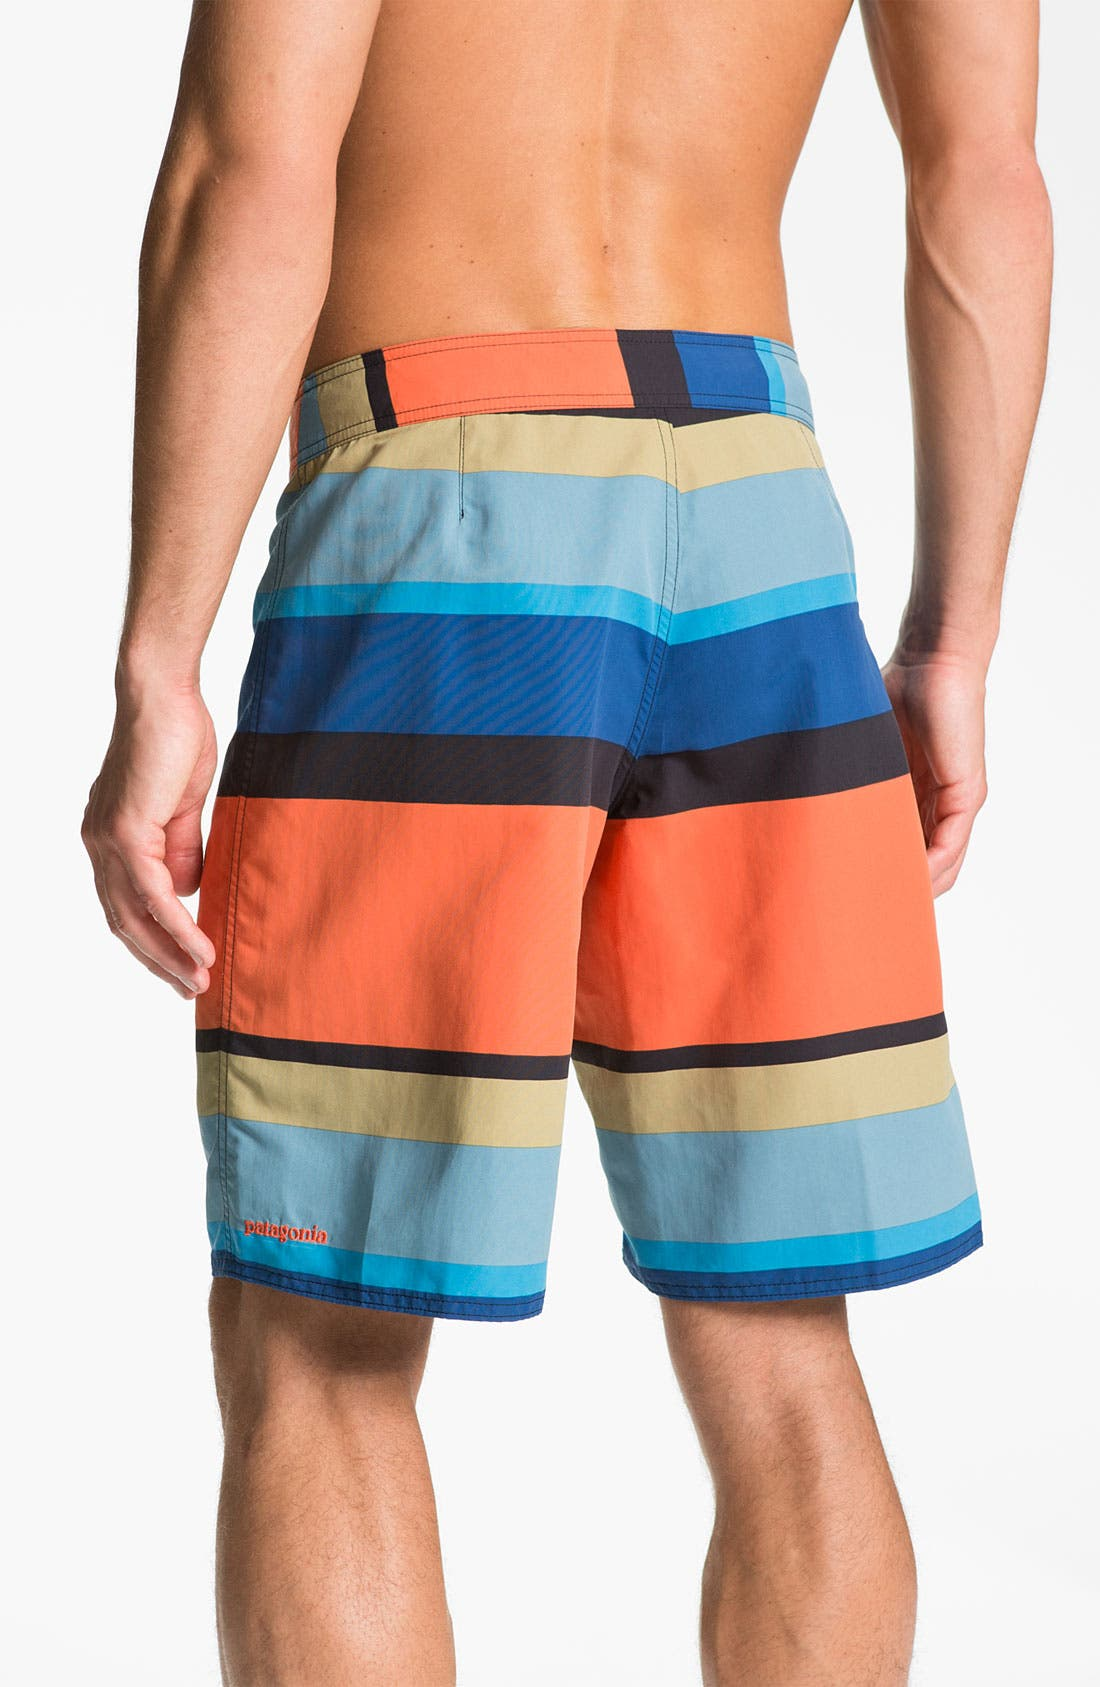 Alternate Image 2  - Patagonia 'Wavefarer' Board Shorts (Men)